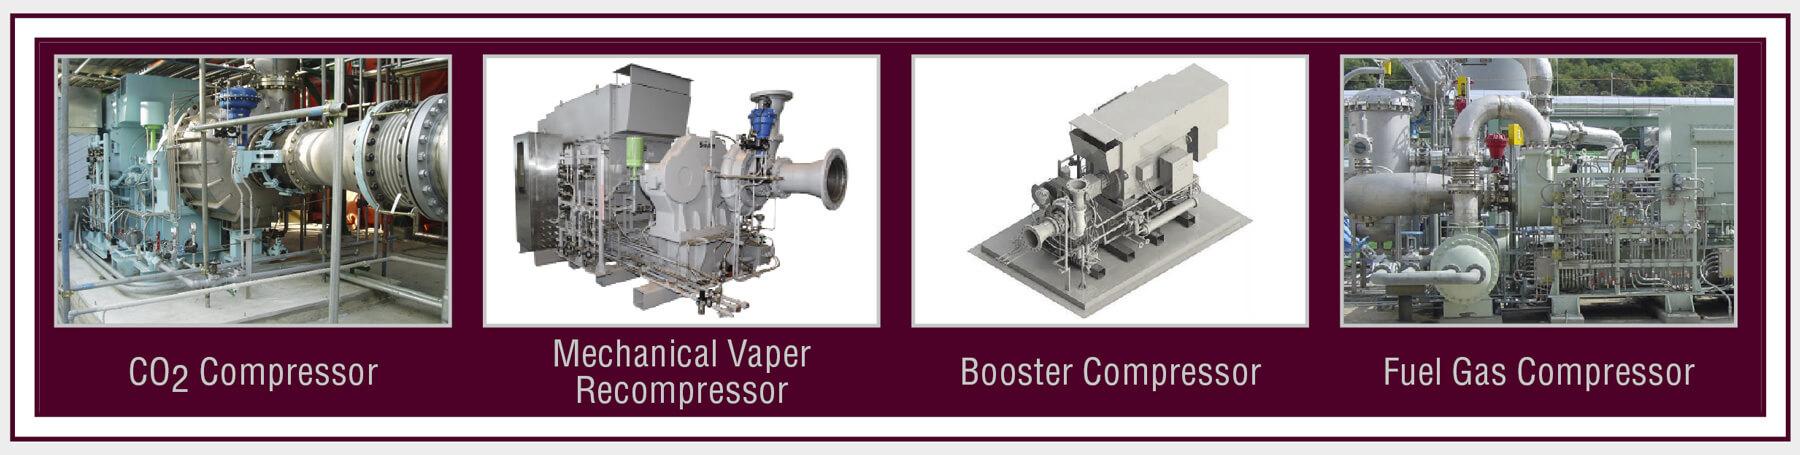 Compressors - CO2 Compressor, Mechanical Vaper Compressor, Booster Compressor, Fuel Gas Compressor